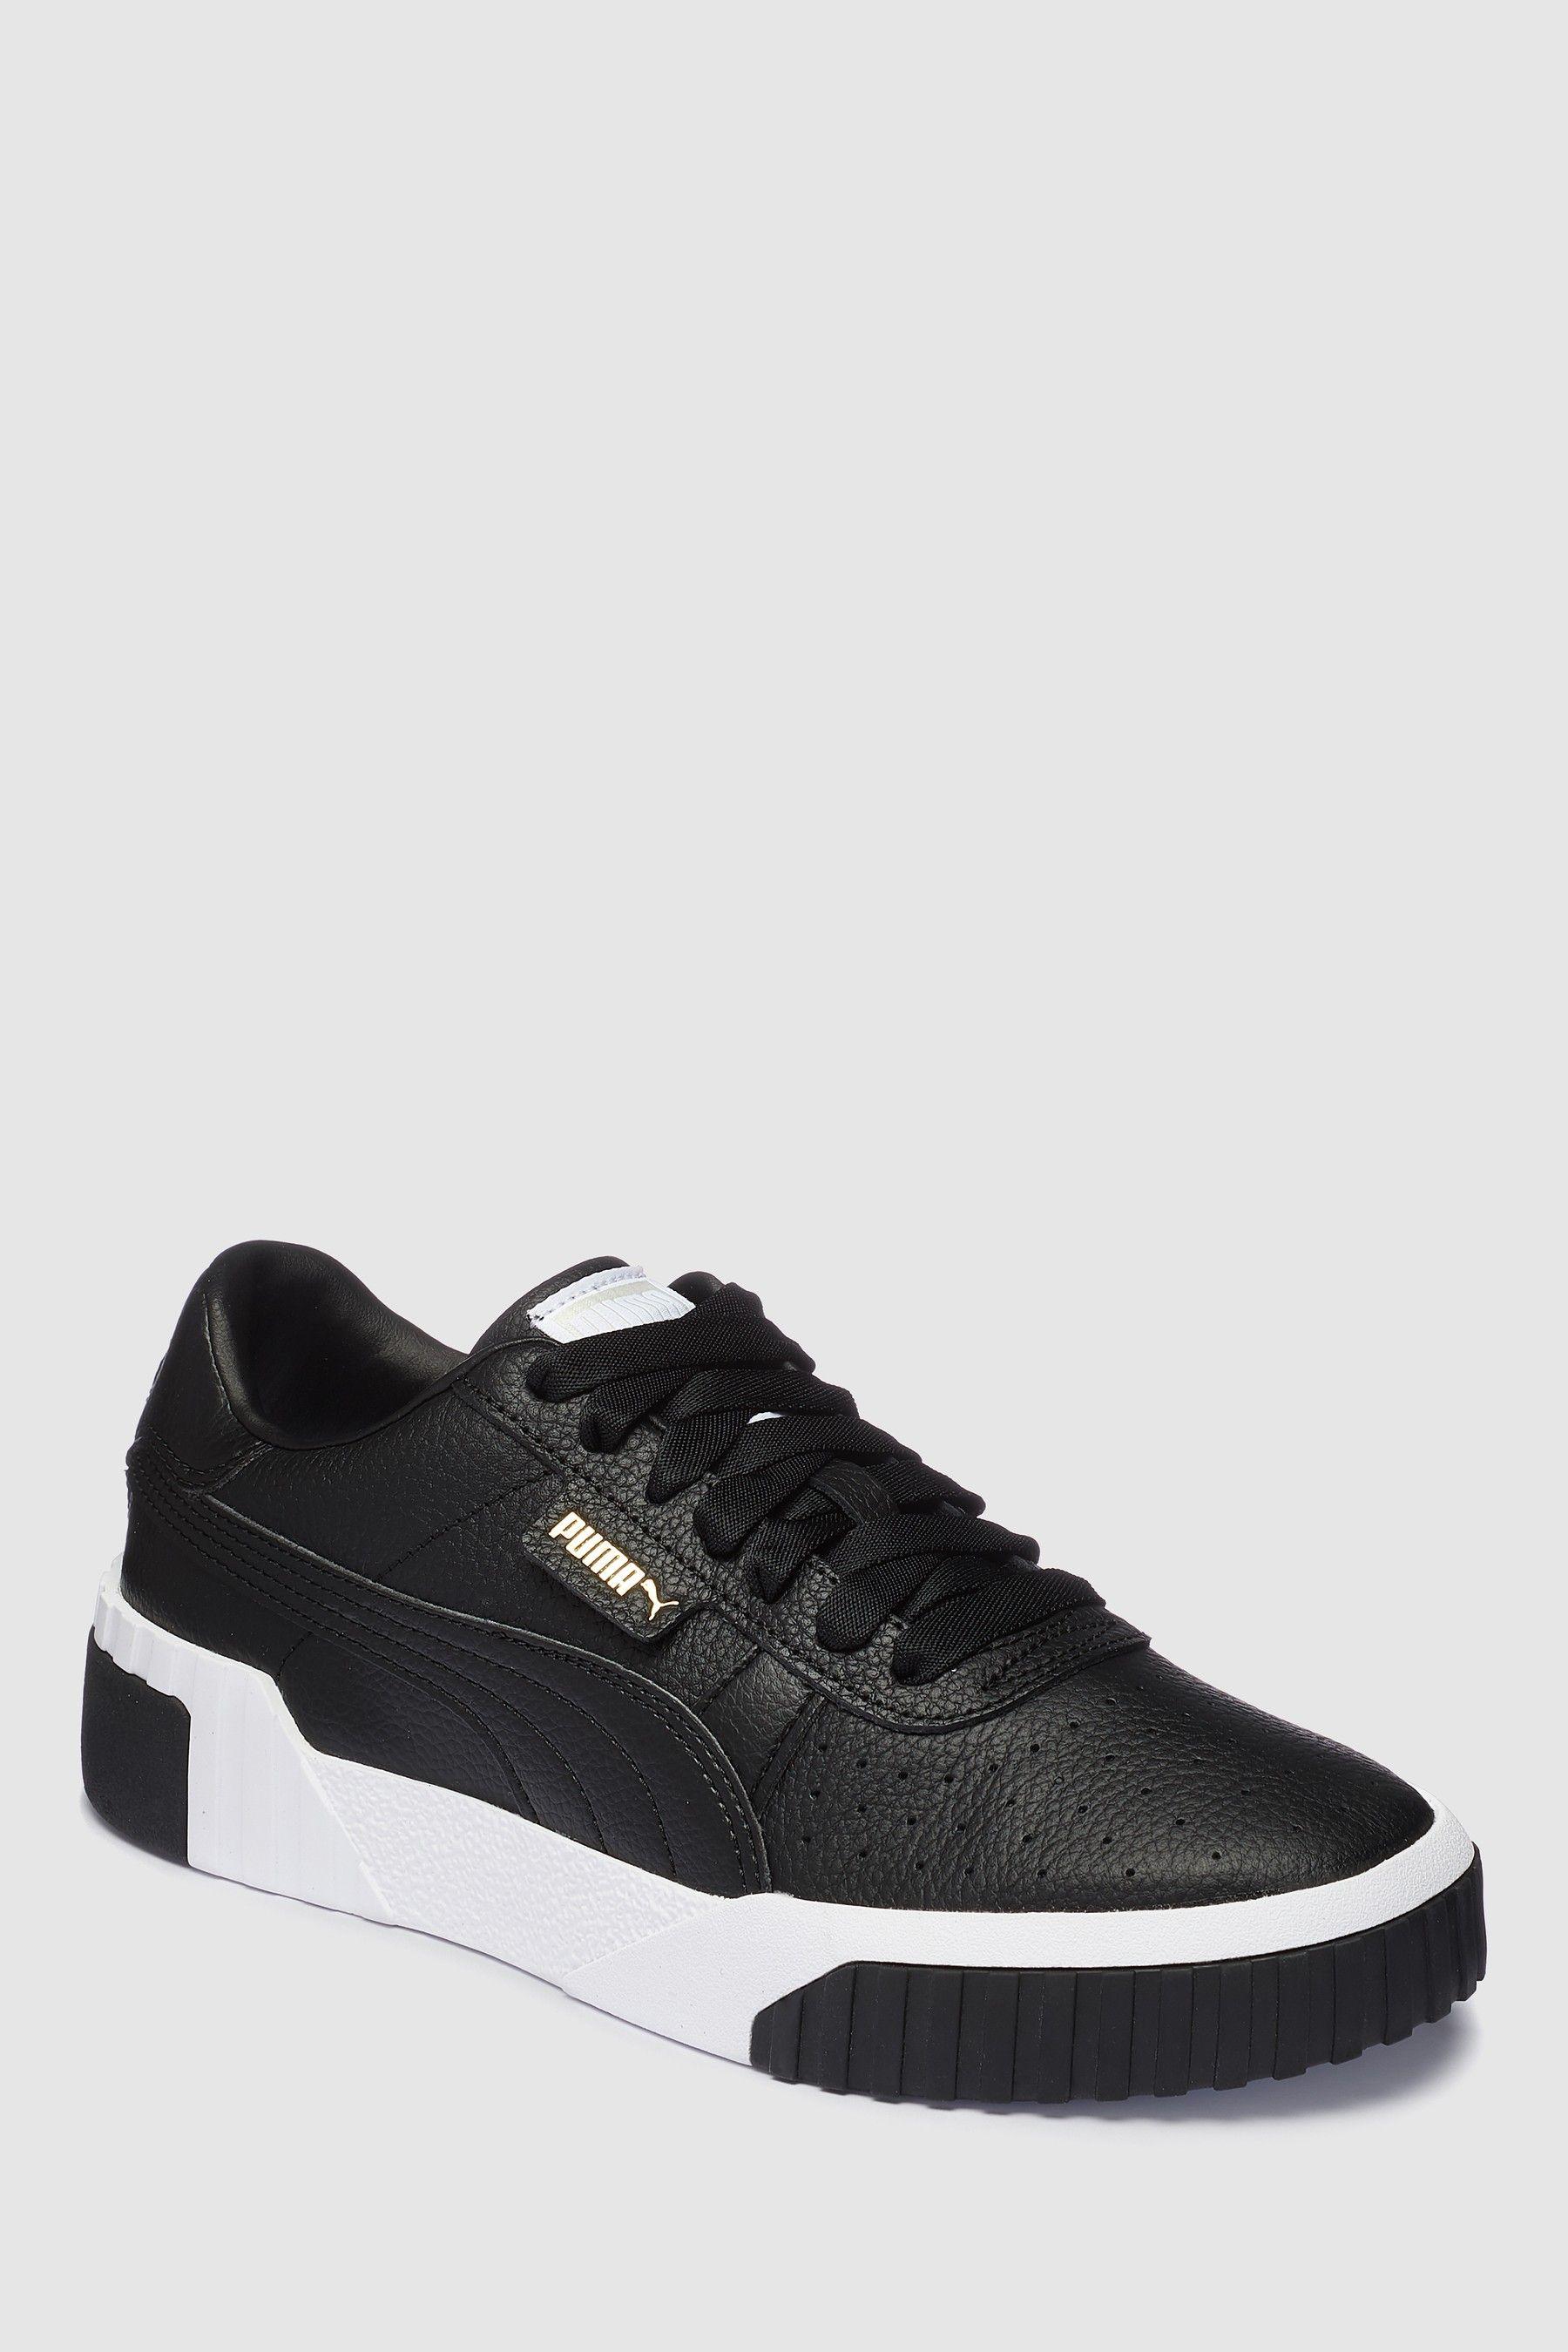 Damen puma Weiß schwarz Cali Leather Sneaker